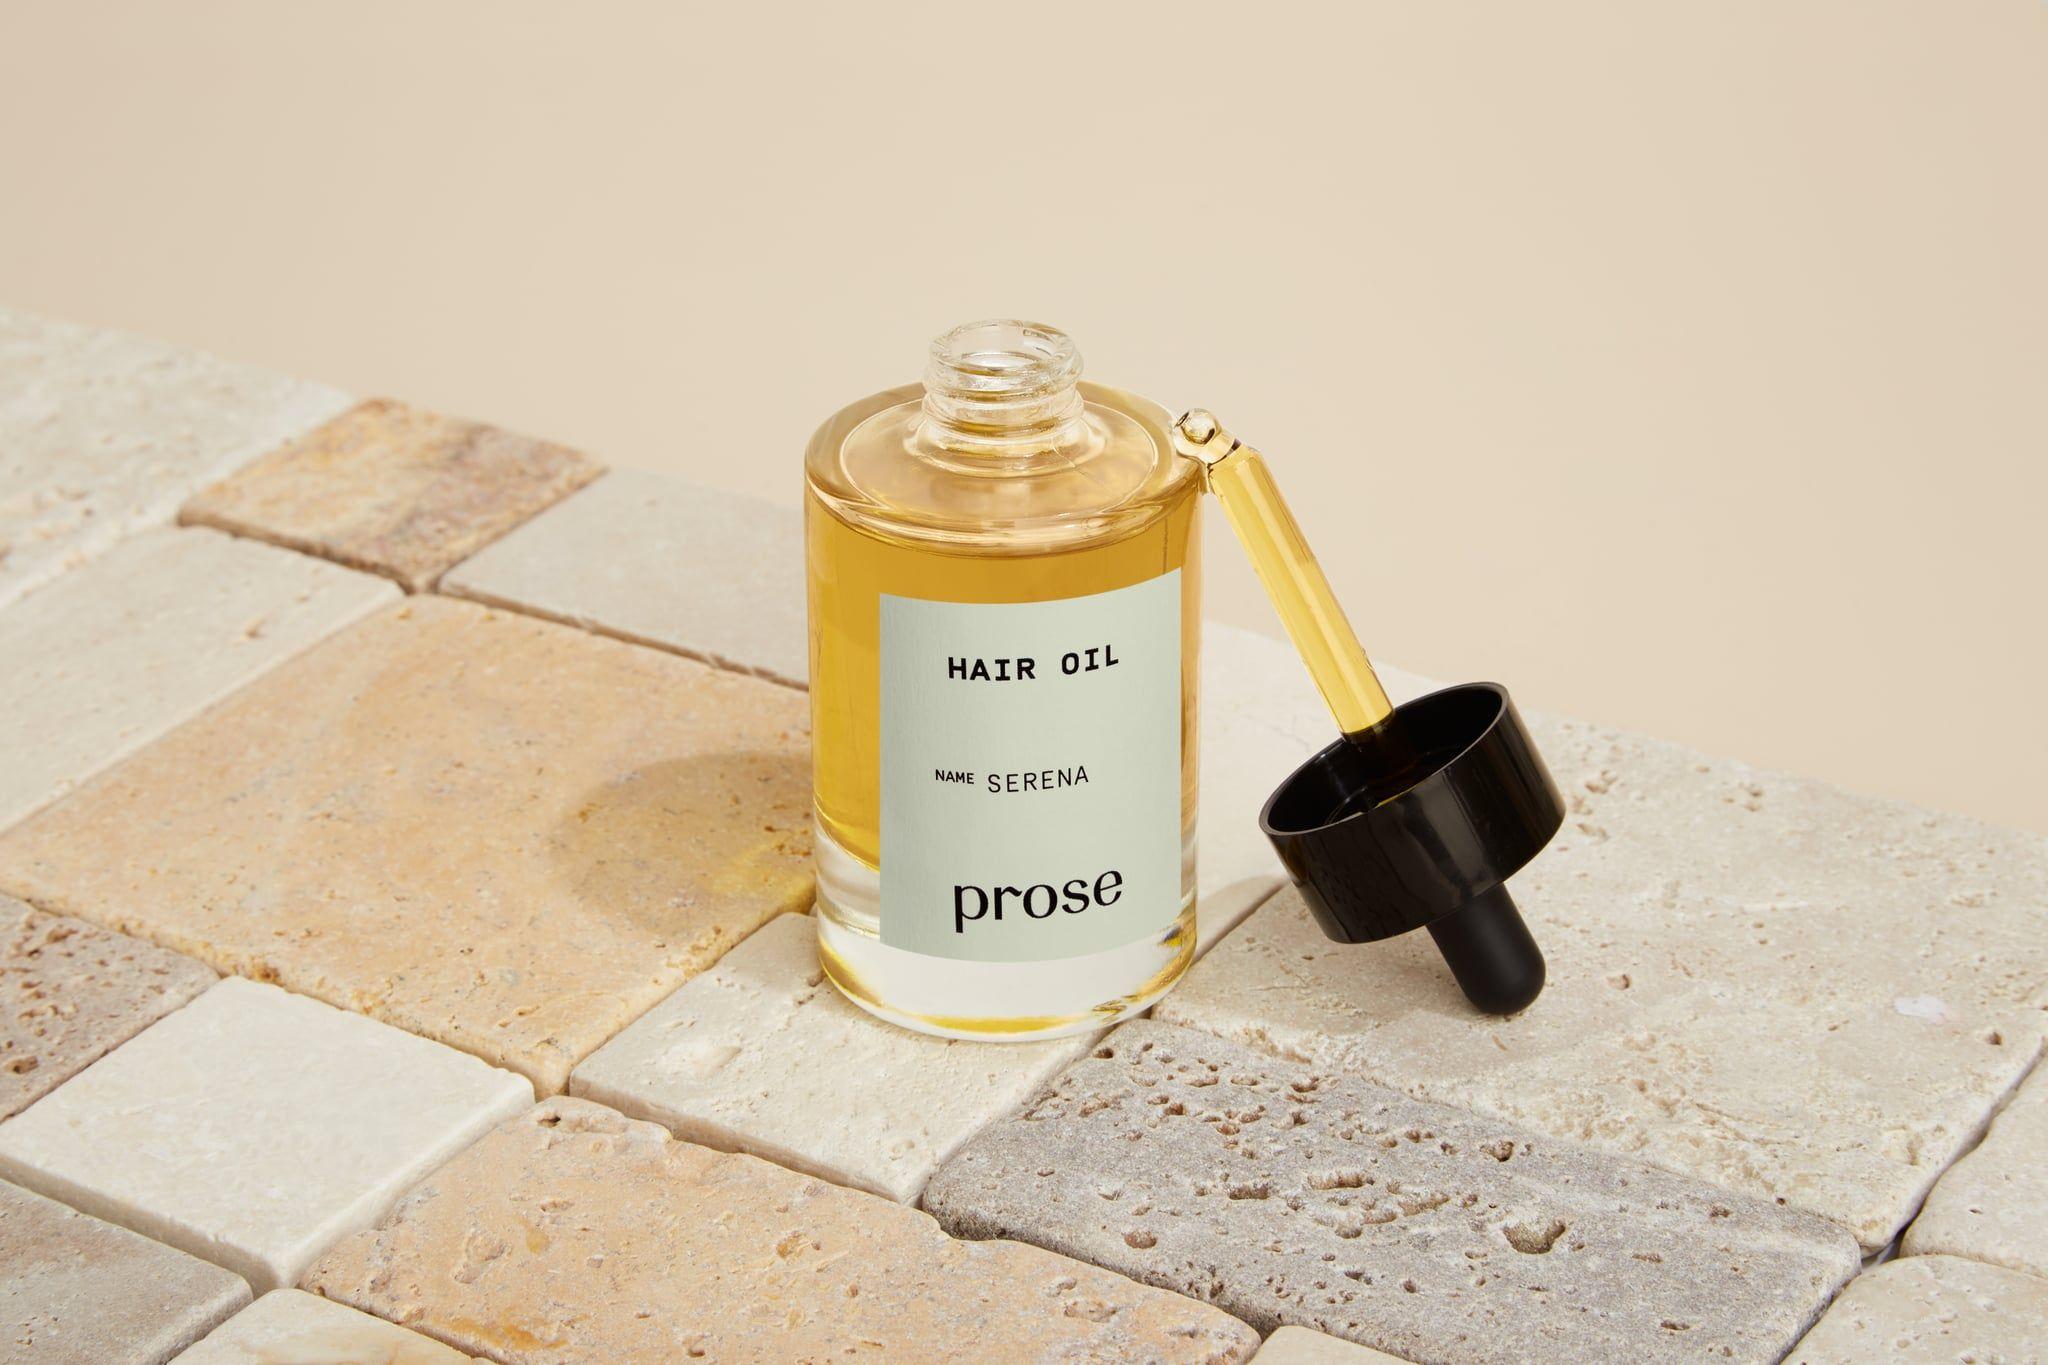 Prose Hair Oil Hair oil, Hair, Beauty hacks